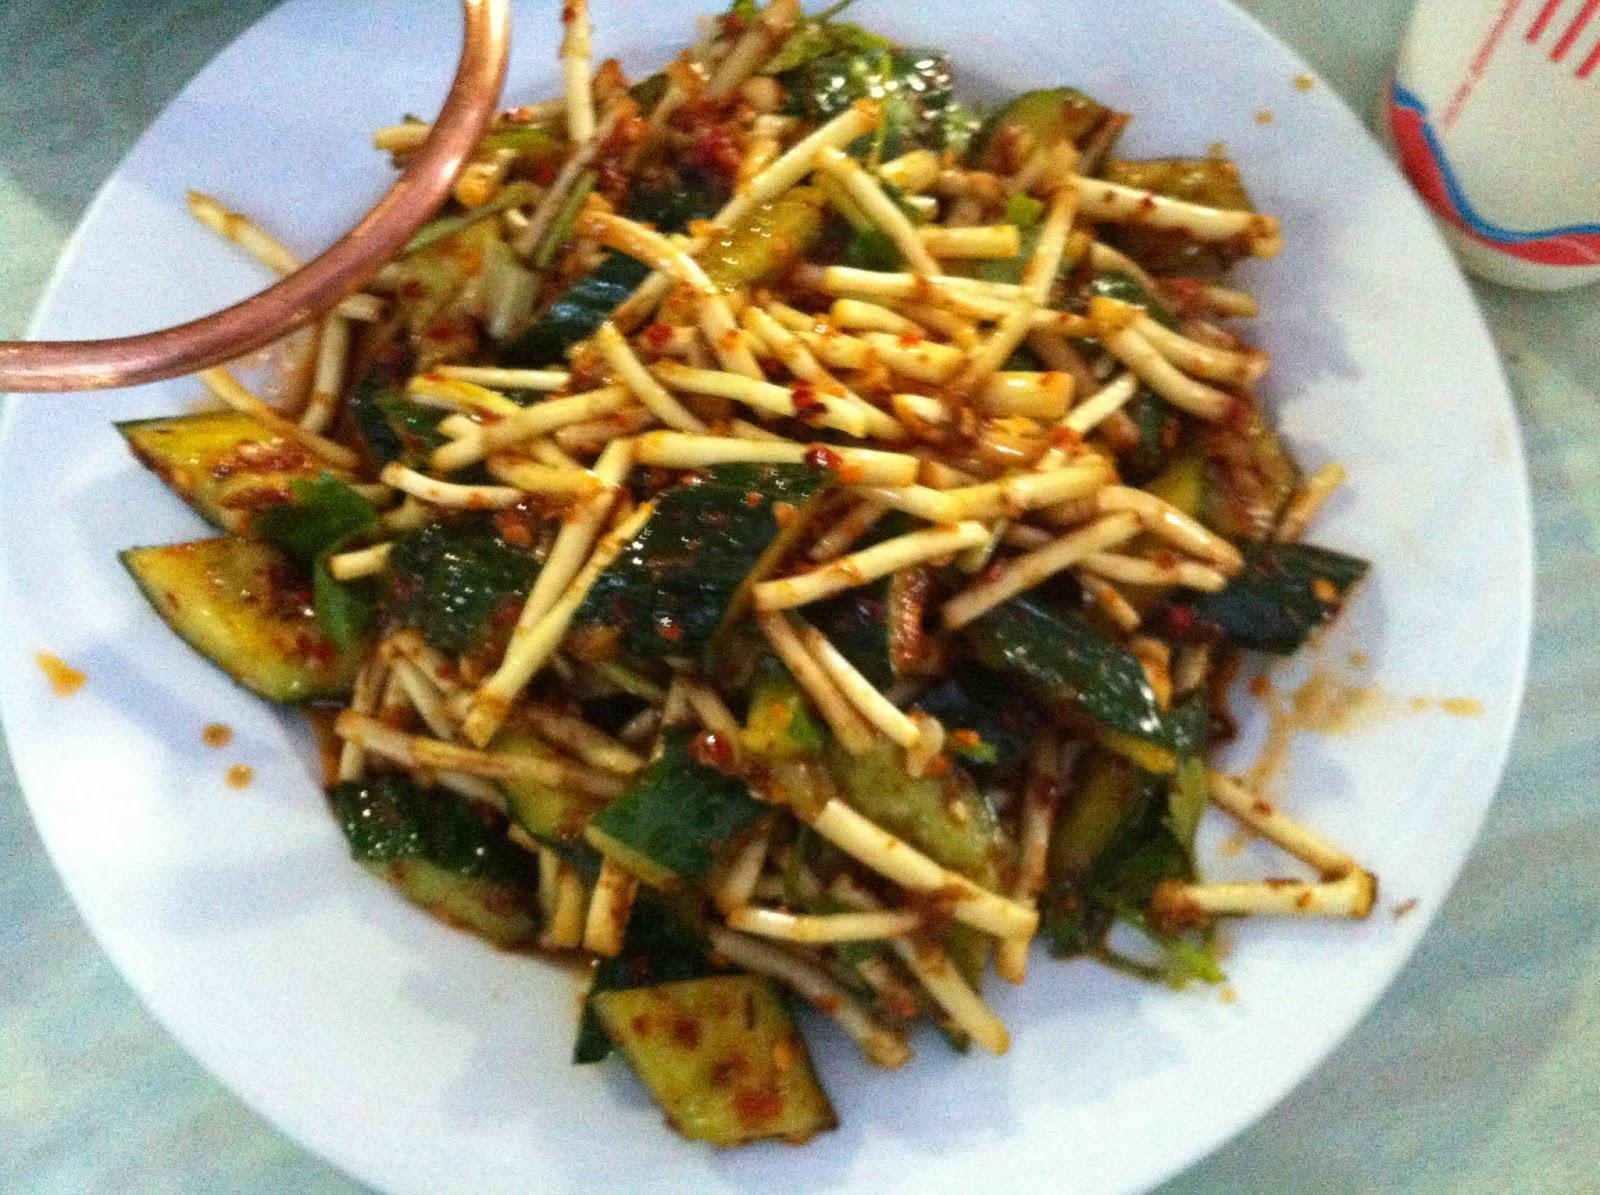 Yu Xing Cai - a delicious Yunnan specialty